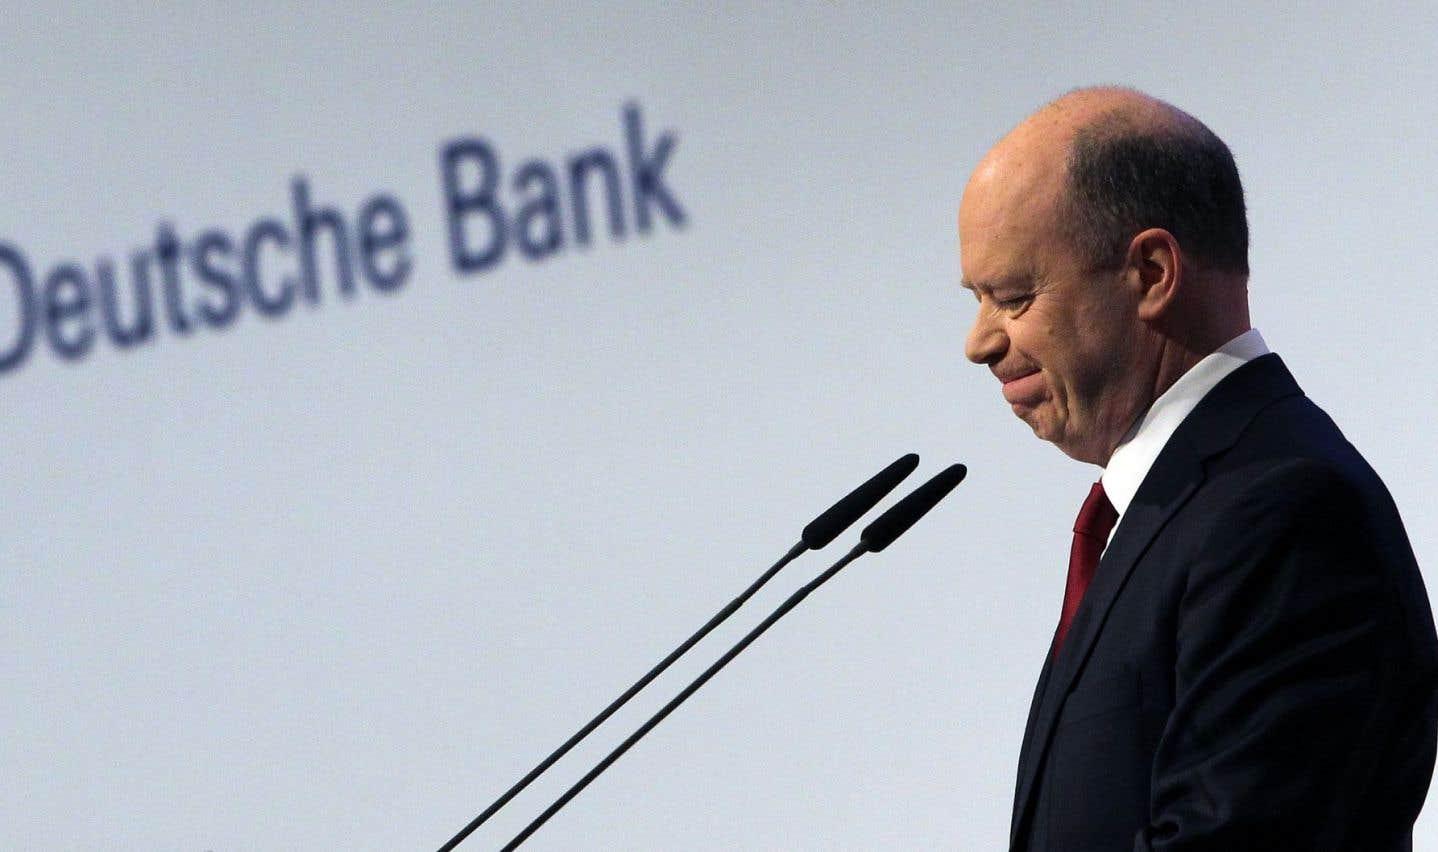 Deutsche Bank nie avoir demandé l'aide de Merkel